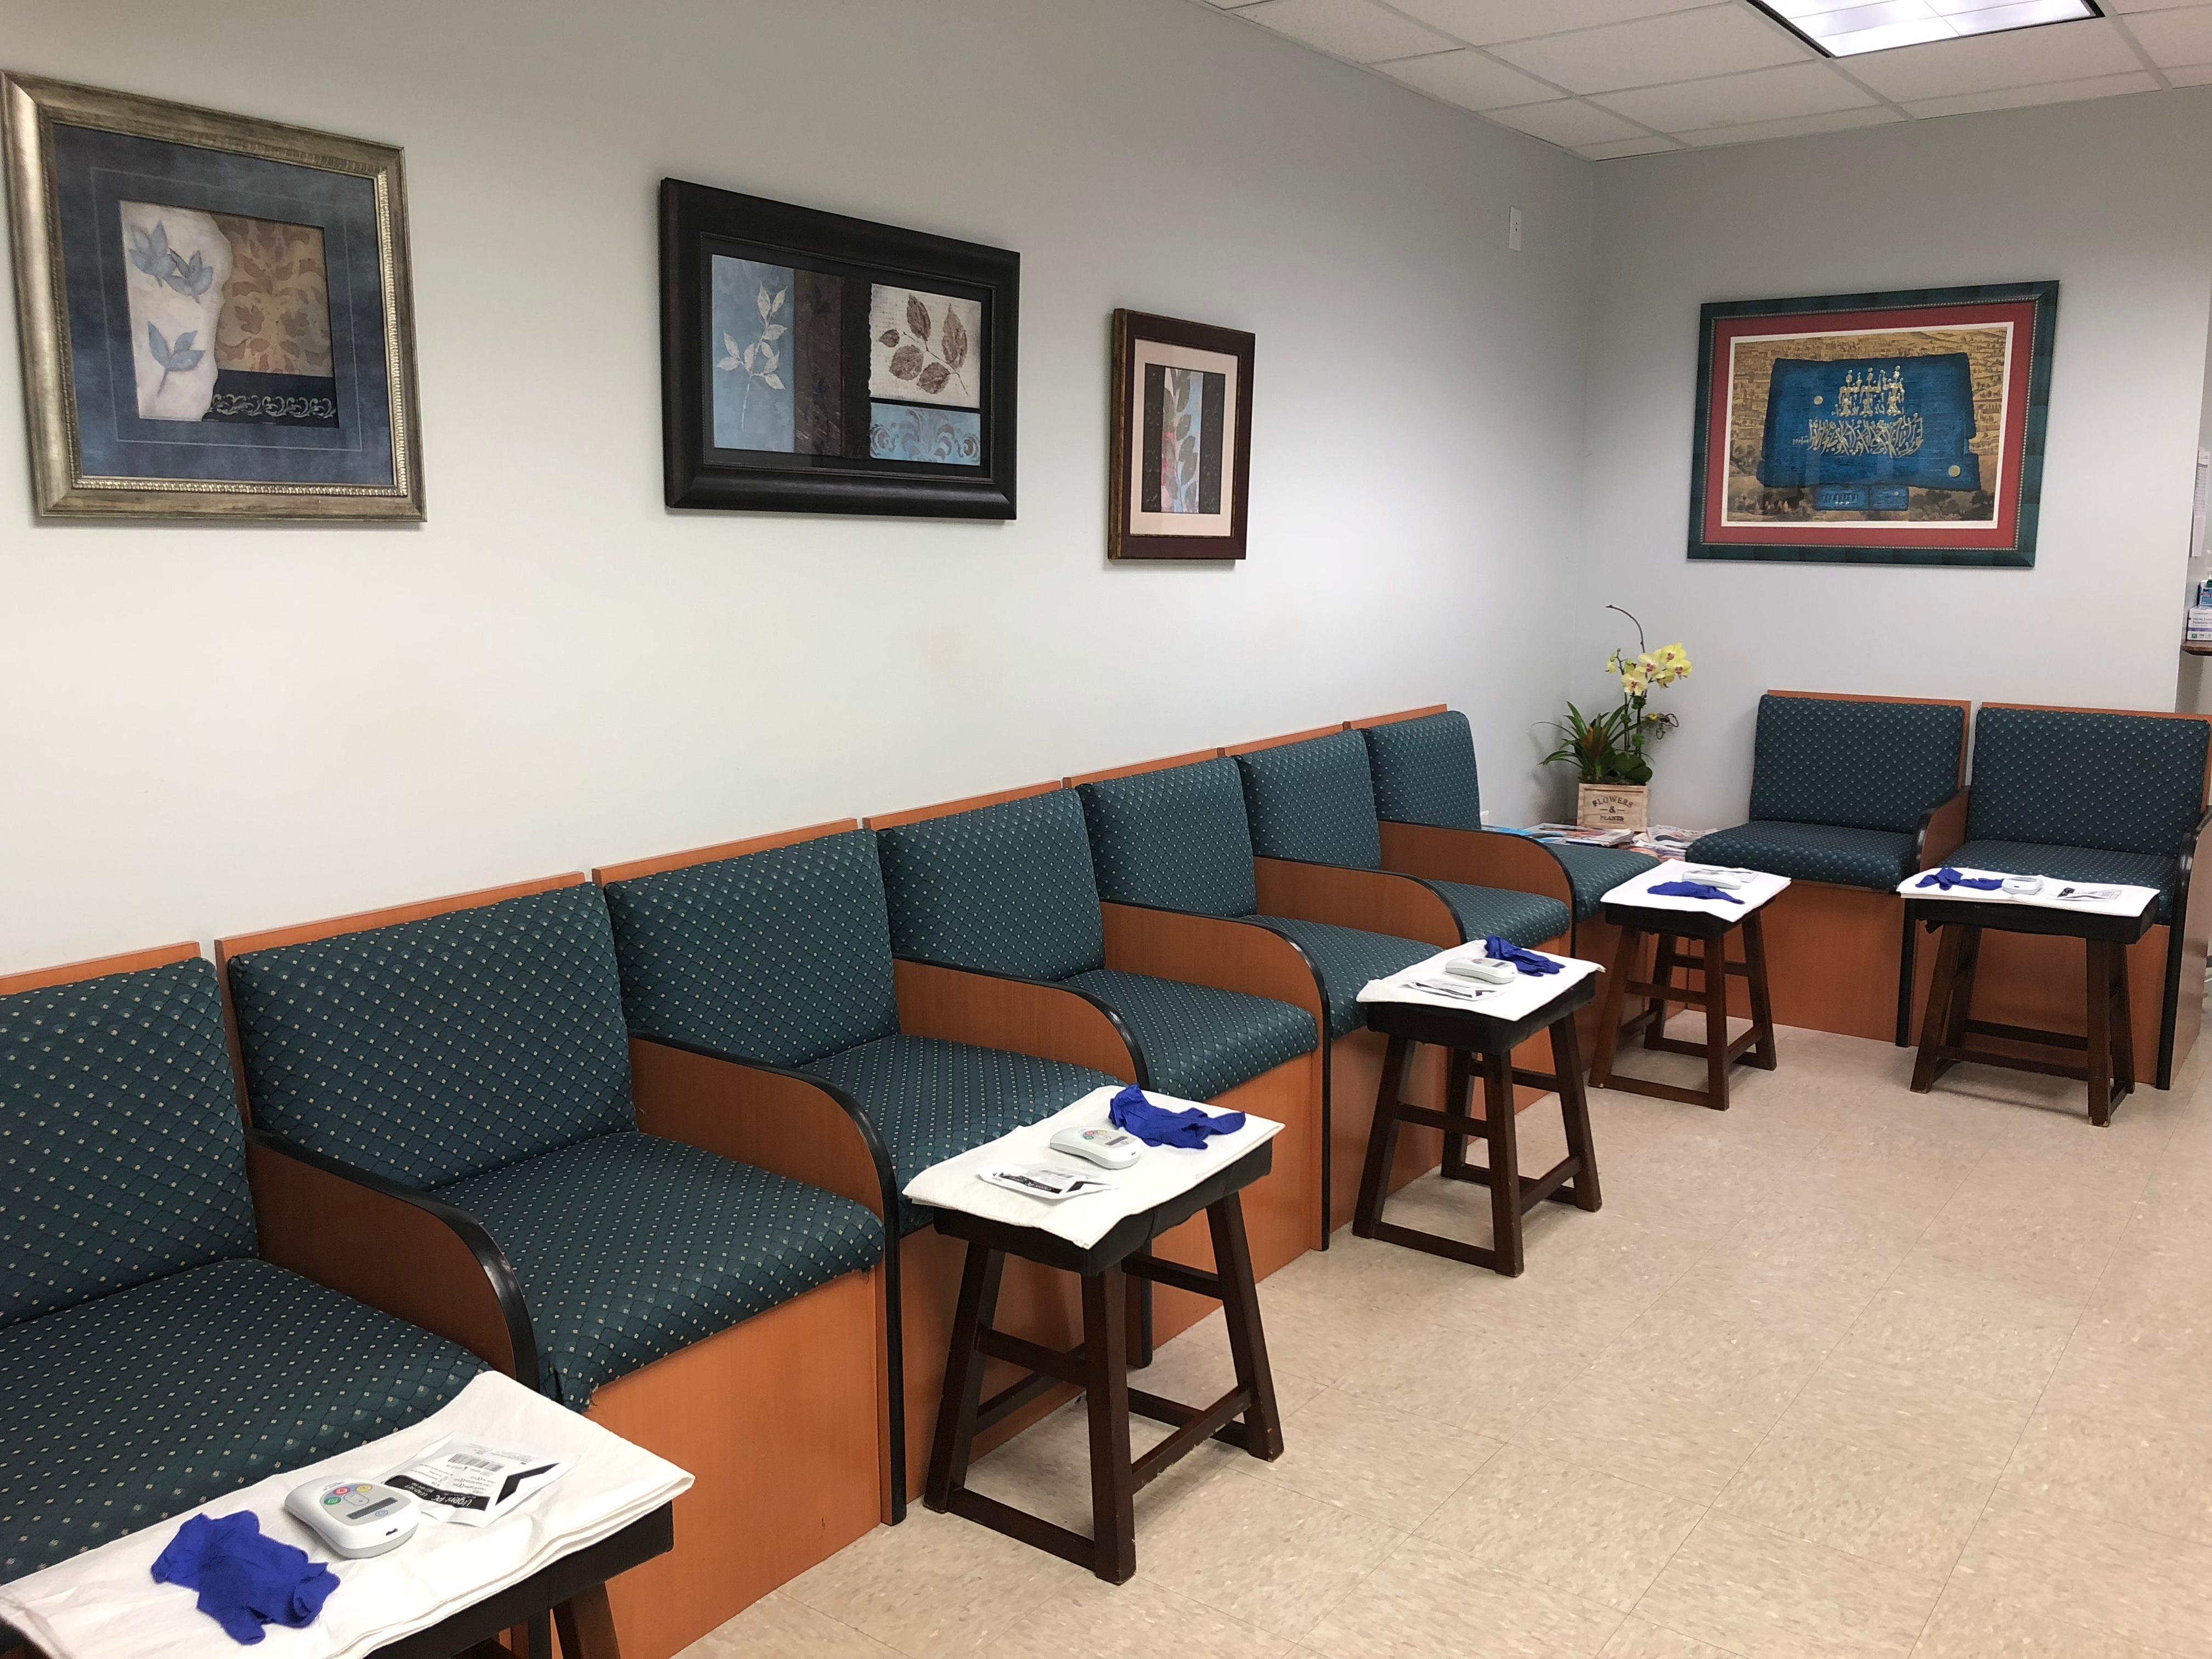 Urology Center of South Florida – Miami image 1